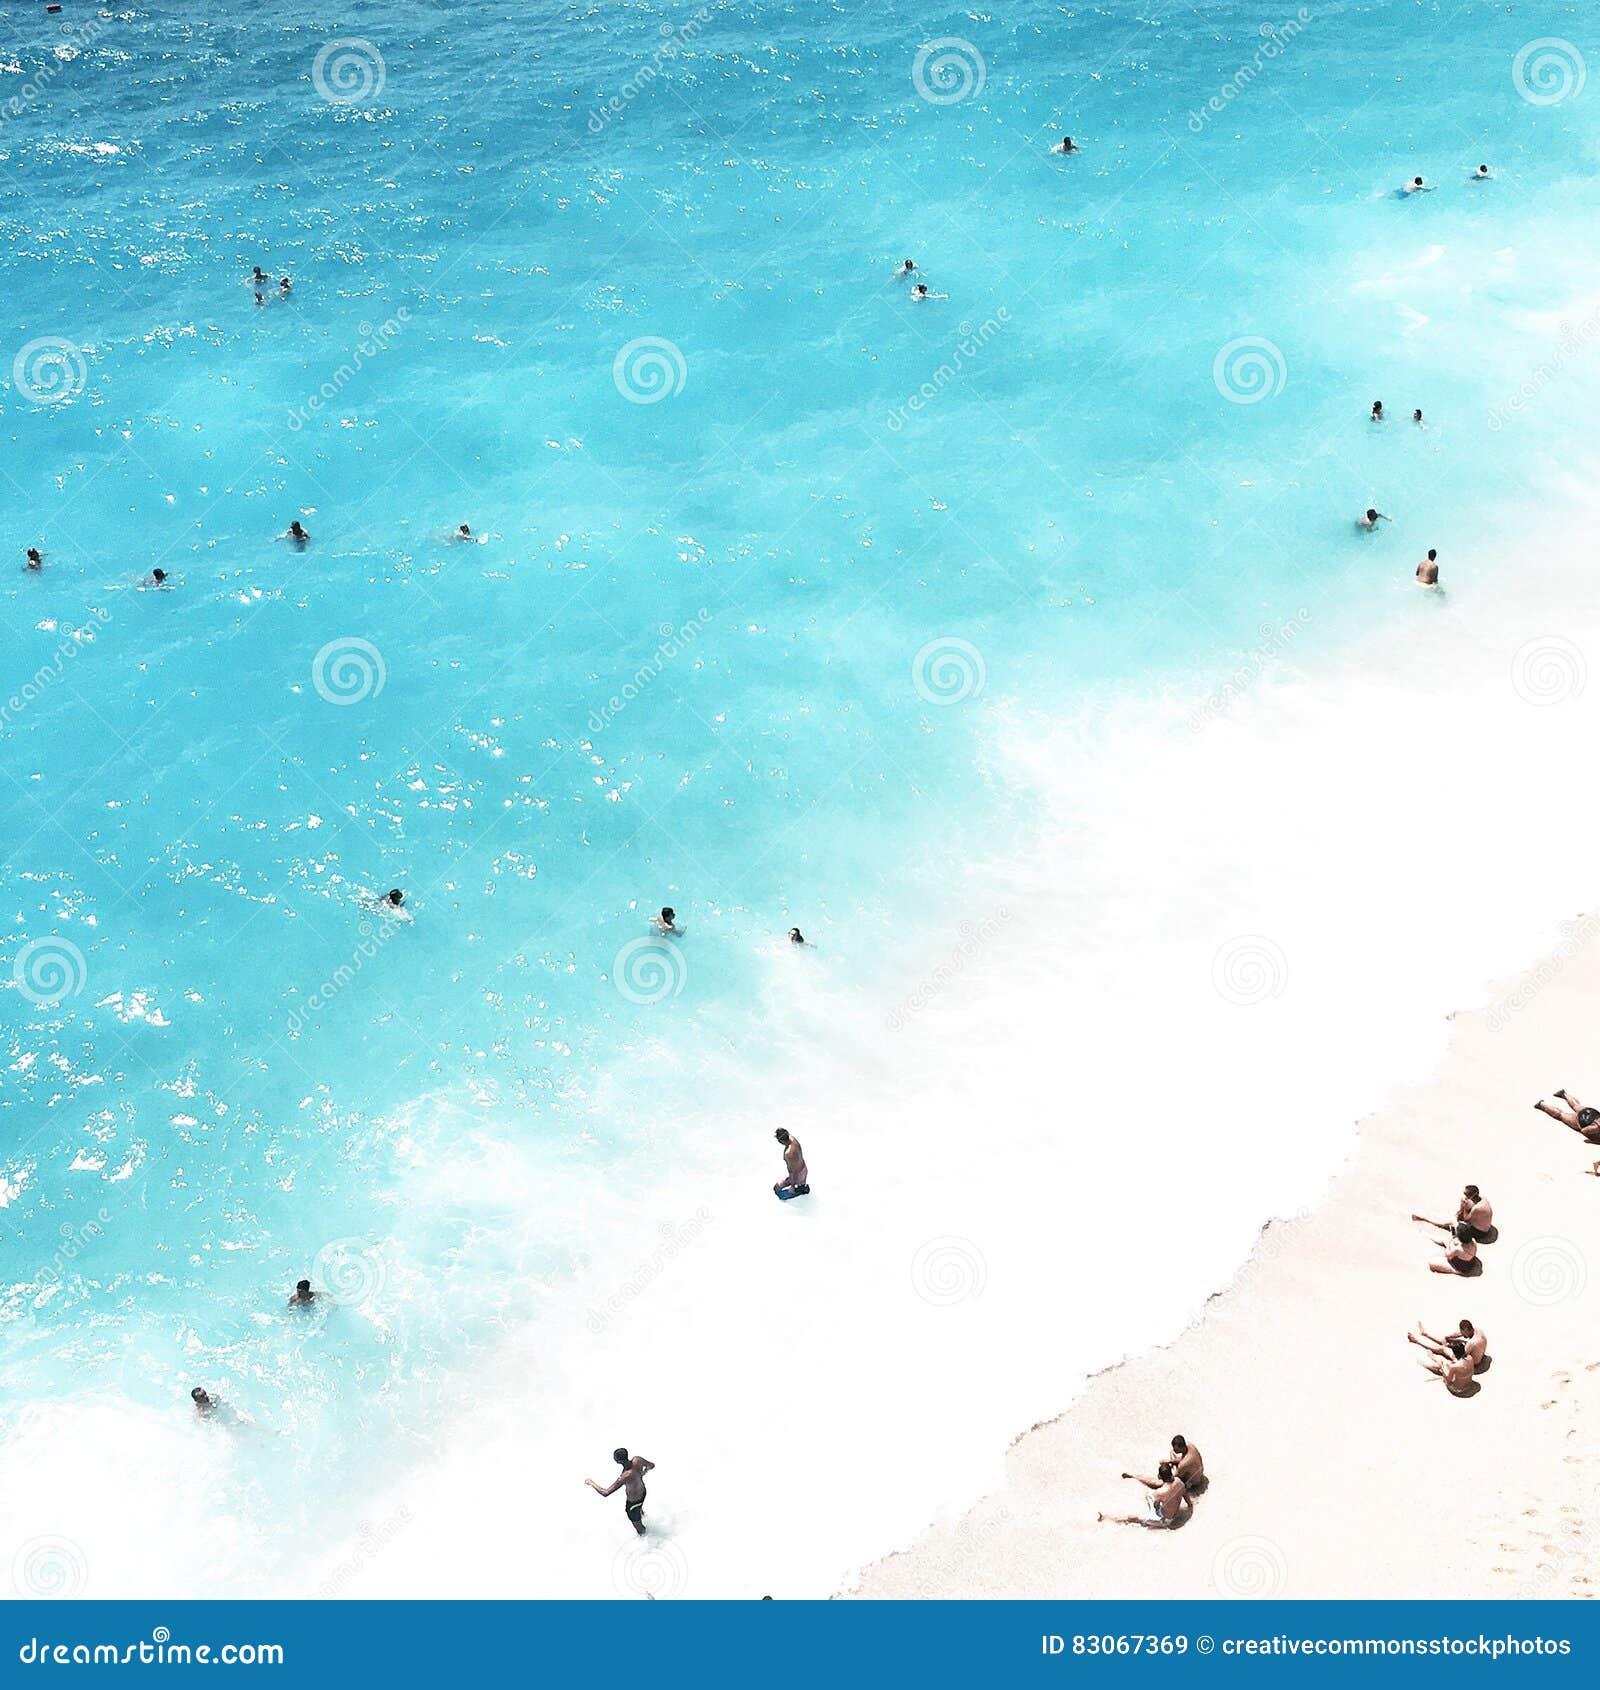 People Swimming In The Sea Picture. Image  83067369 e5b9771b5f